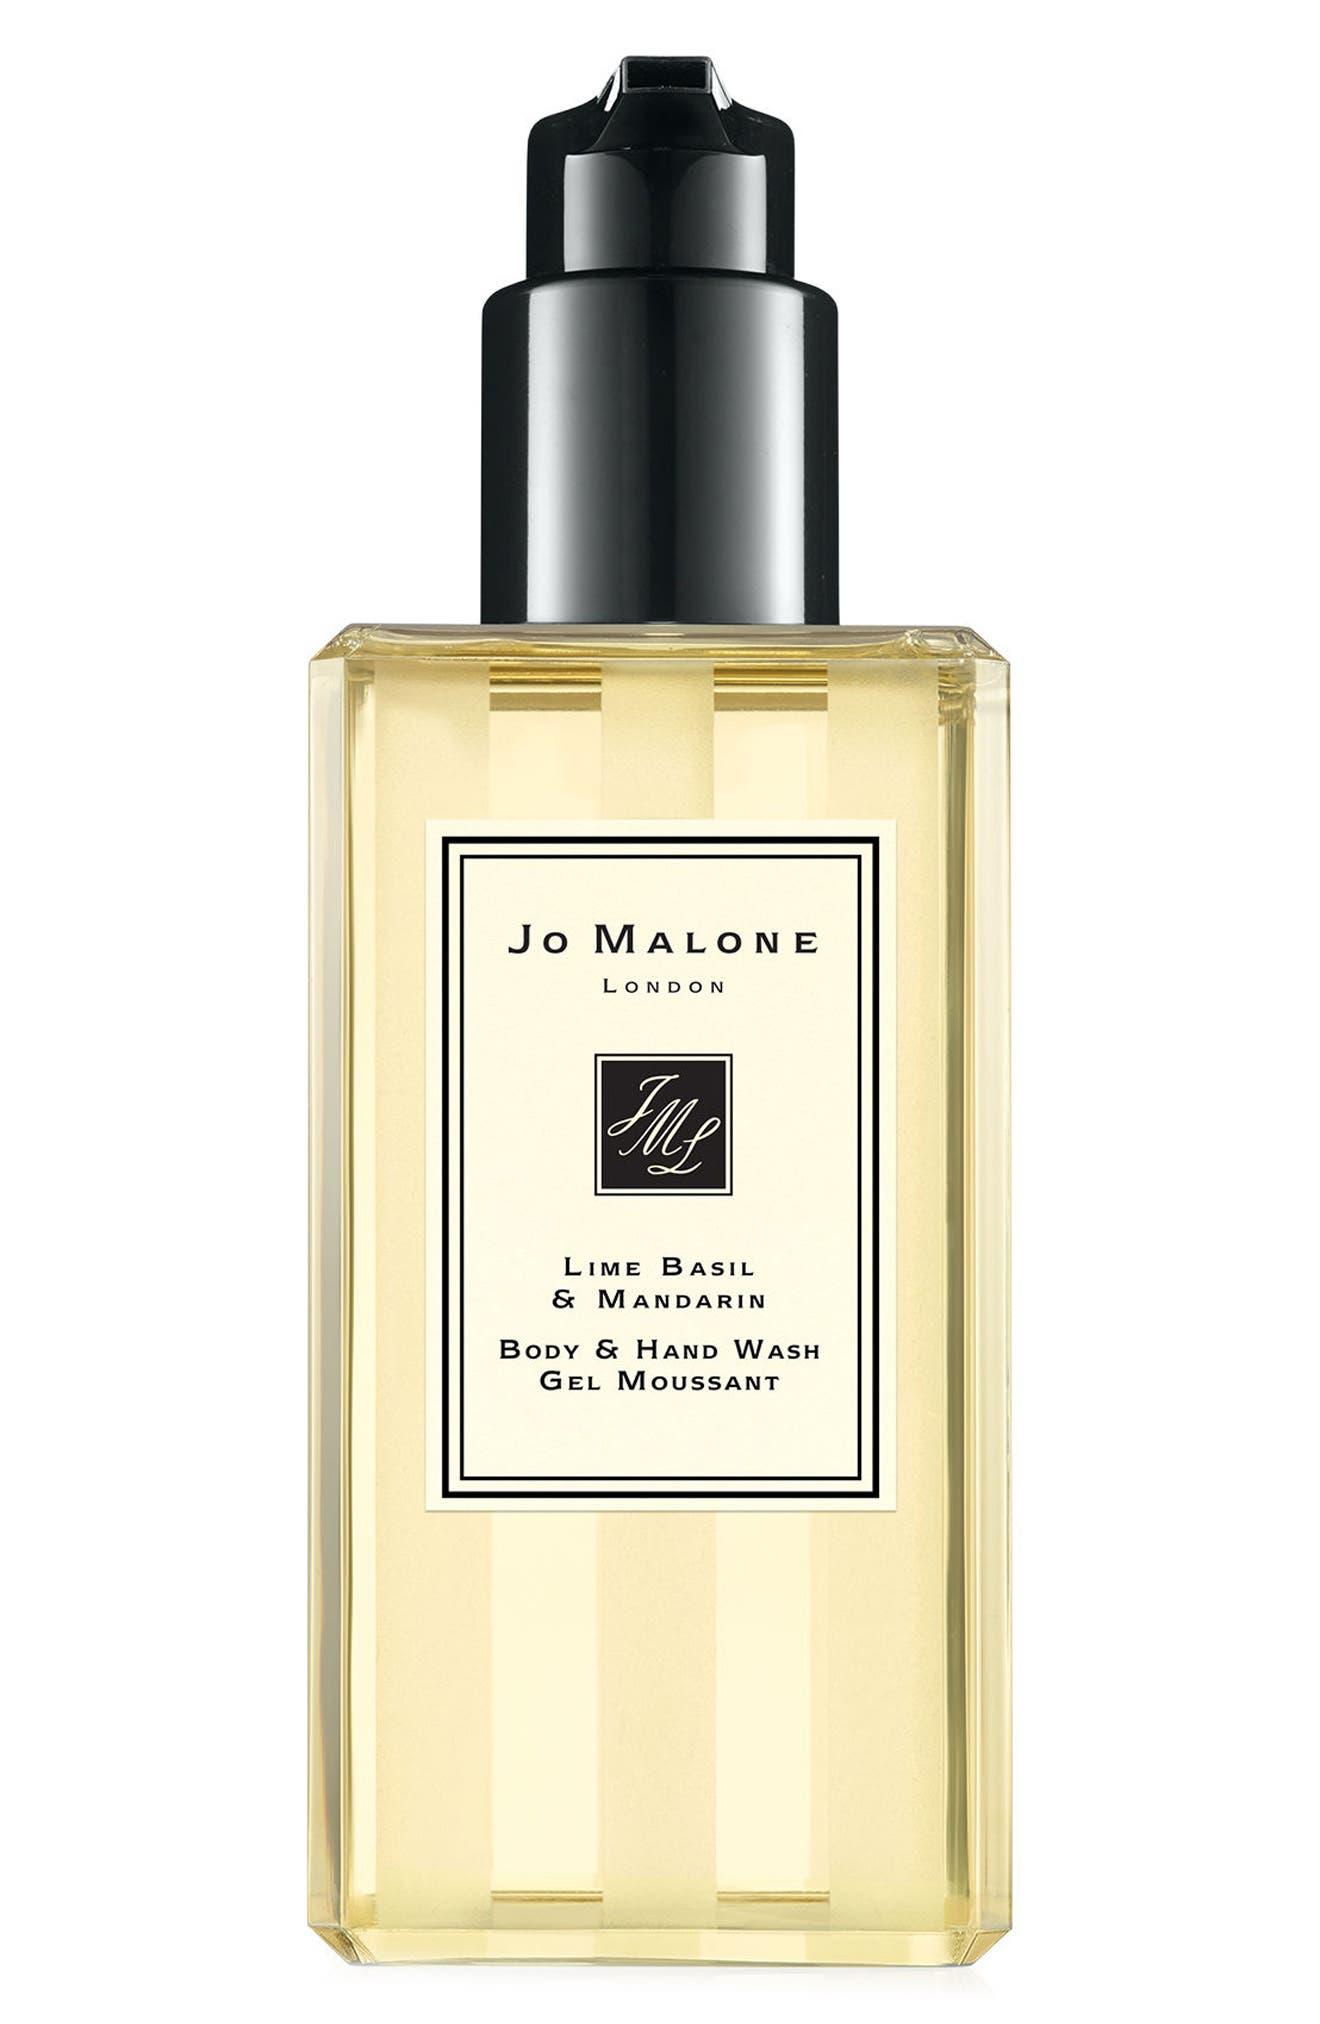 Jo Malone London(TM) Lime Basil & Mandarin Body & Hand Wash